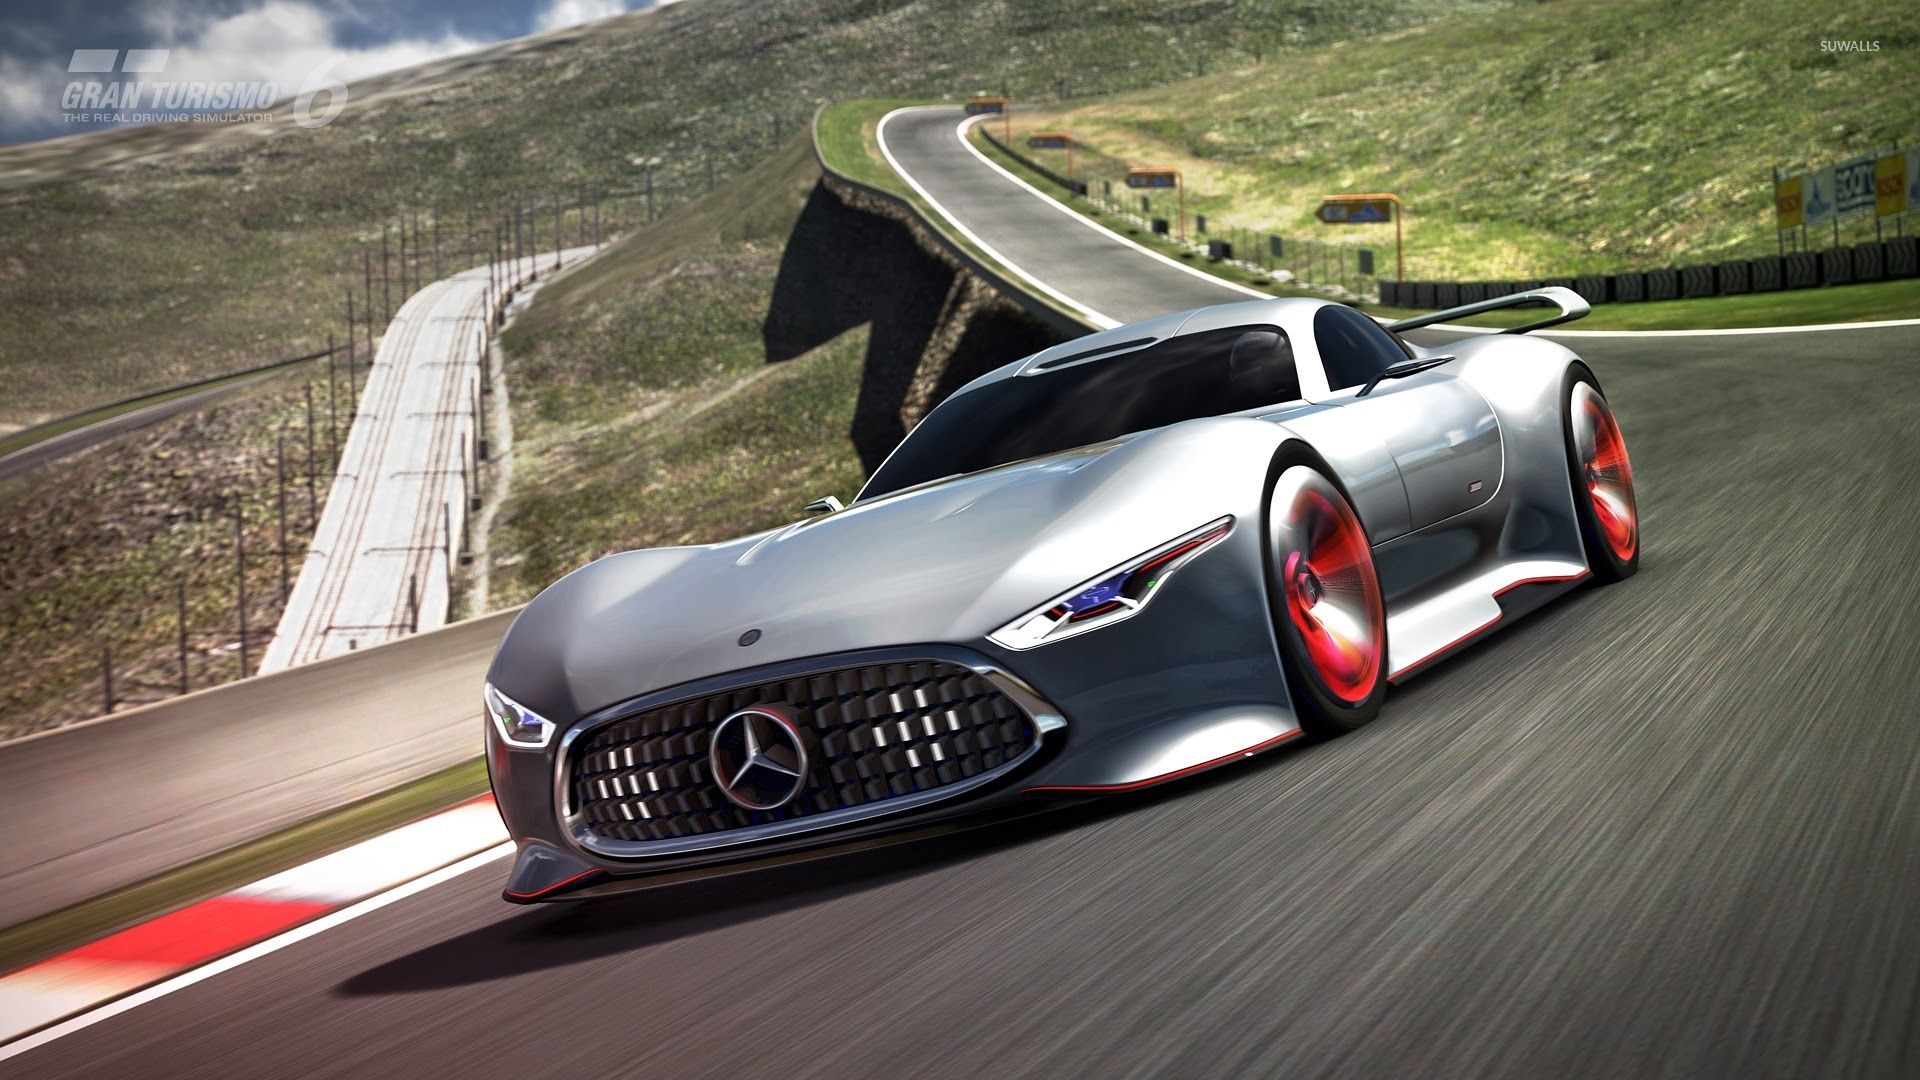 Mercedes Benz AMG Vision Gran Turismo   Gran Turismo 6 1920x1080